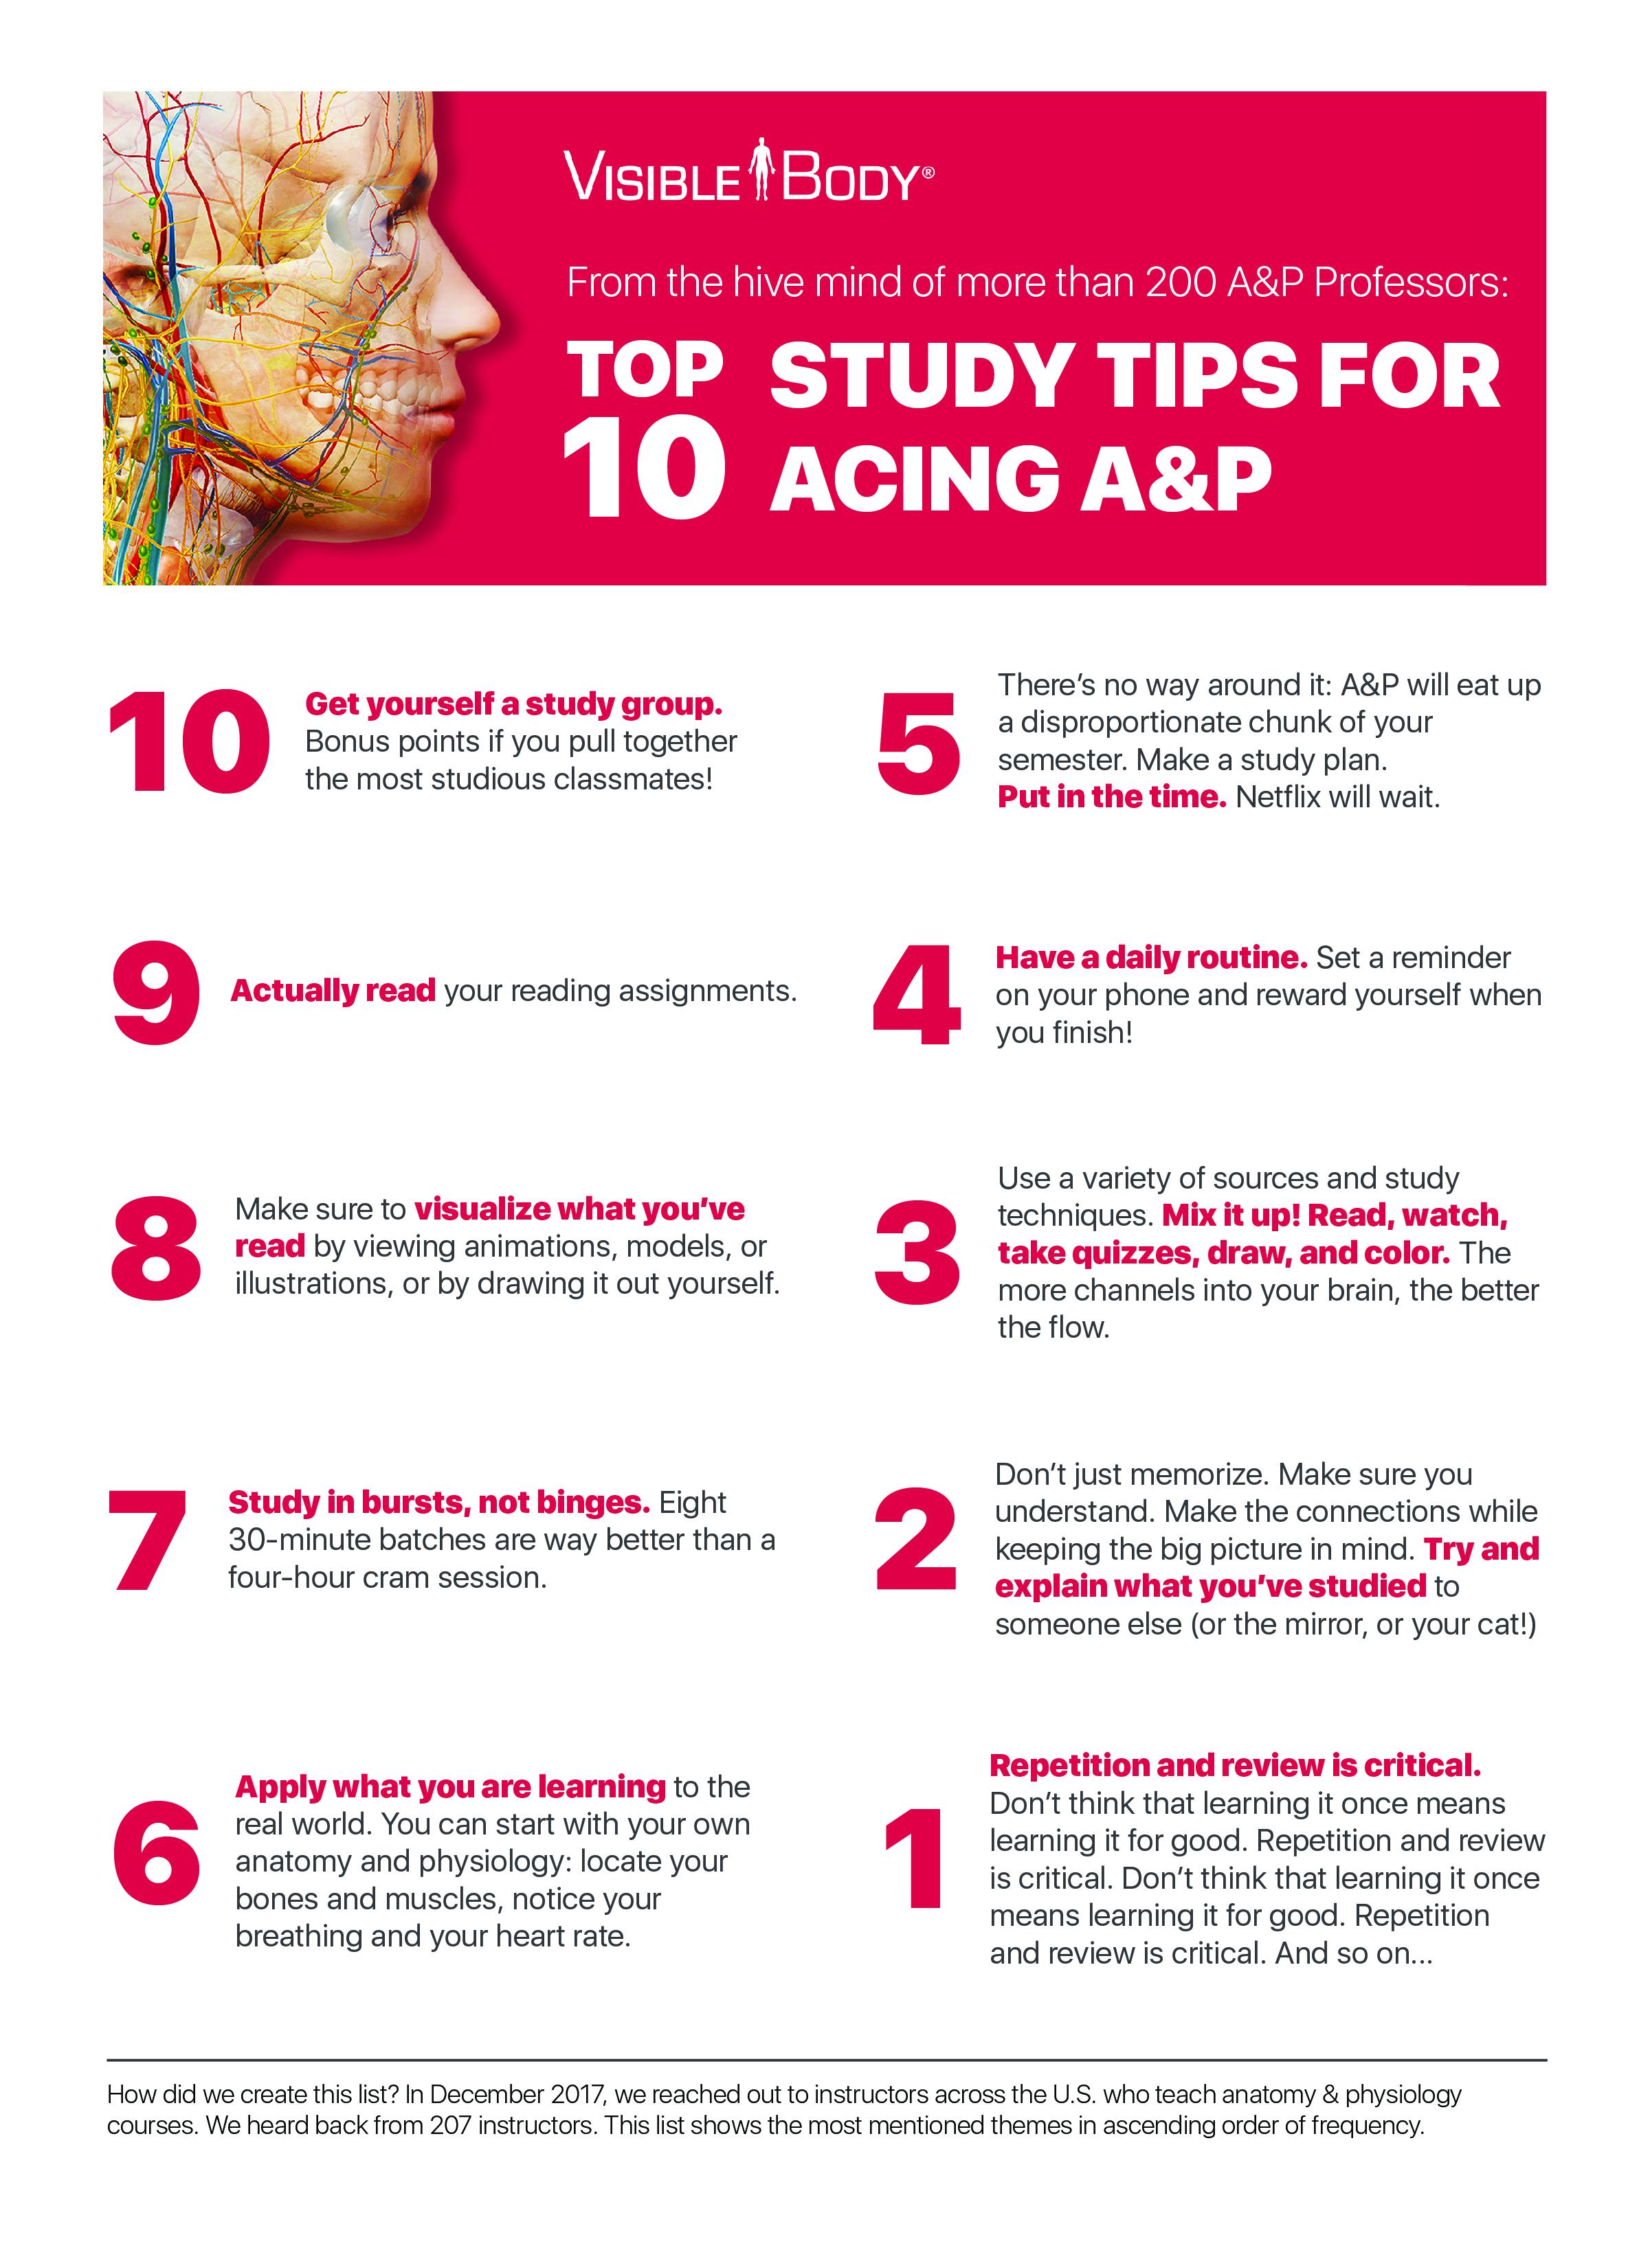 Enchanting Studying Anatomy And Physiology Tips Image - Anatomy ...